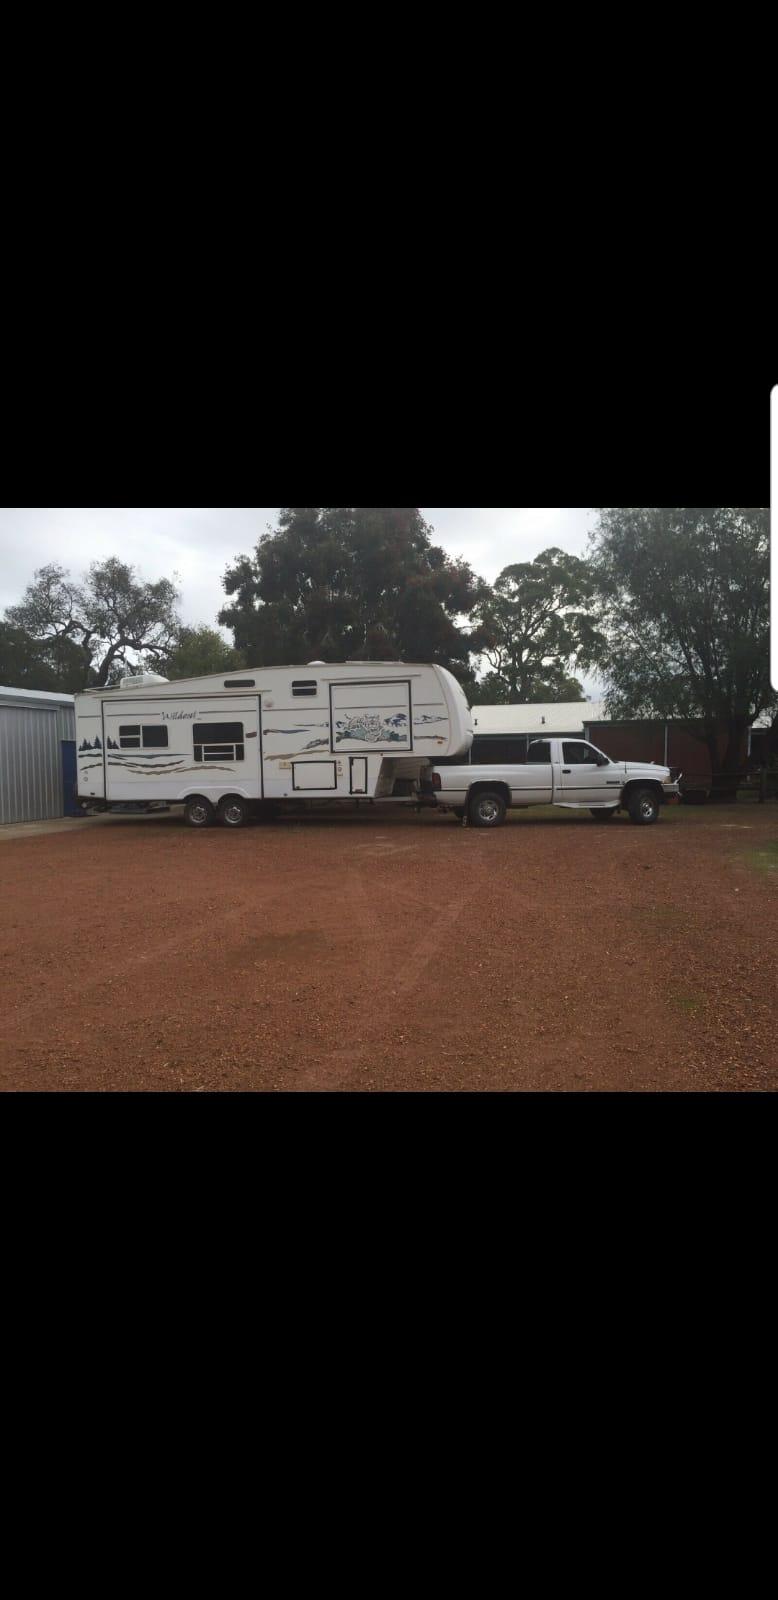 Fleetwood fifth wheel caravan